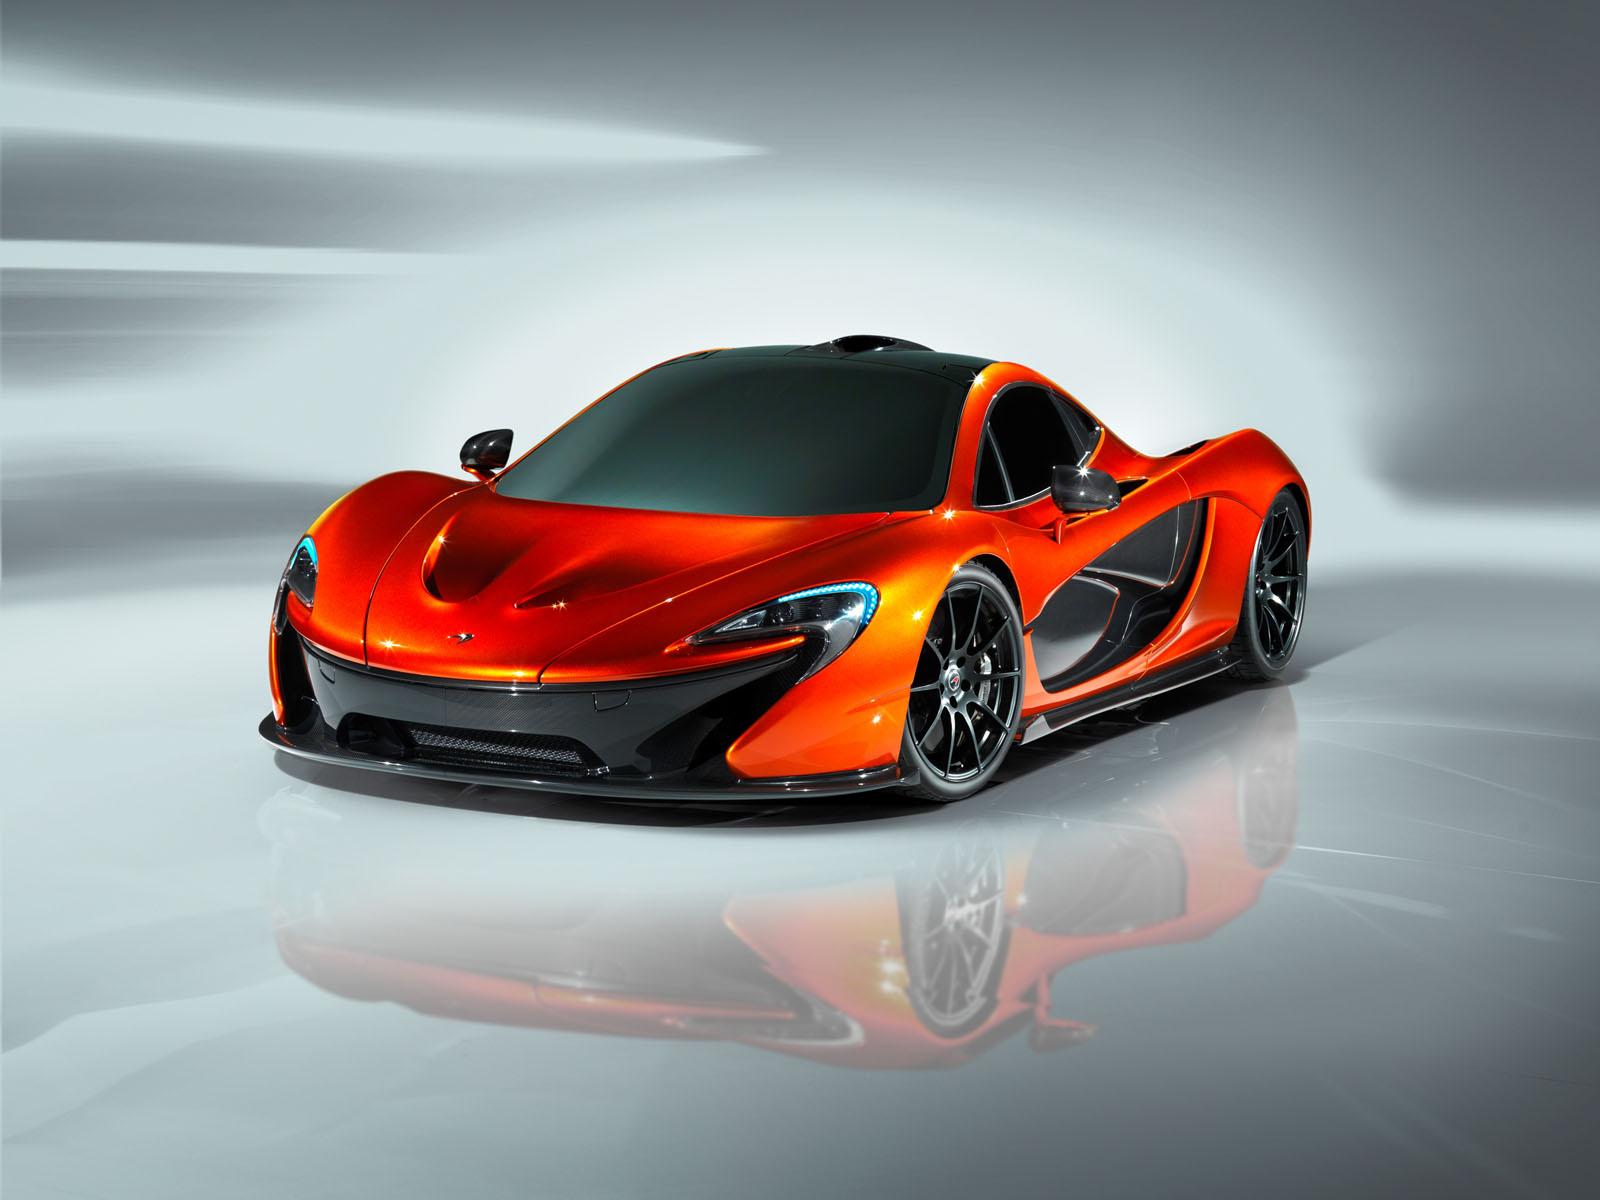 McLaren ya habla del sucesor del P1